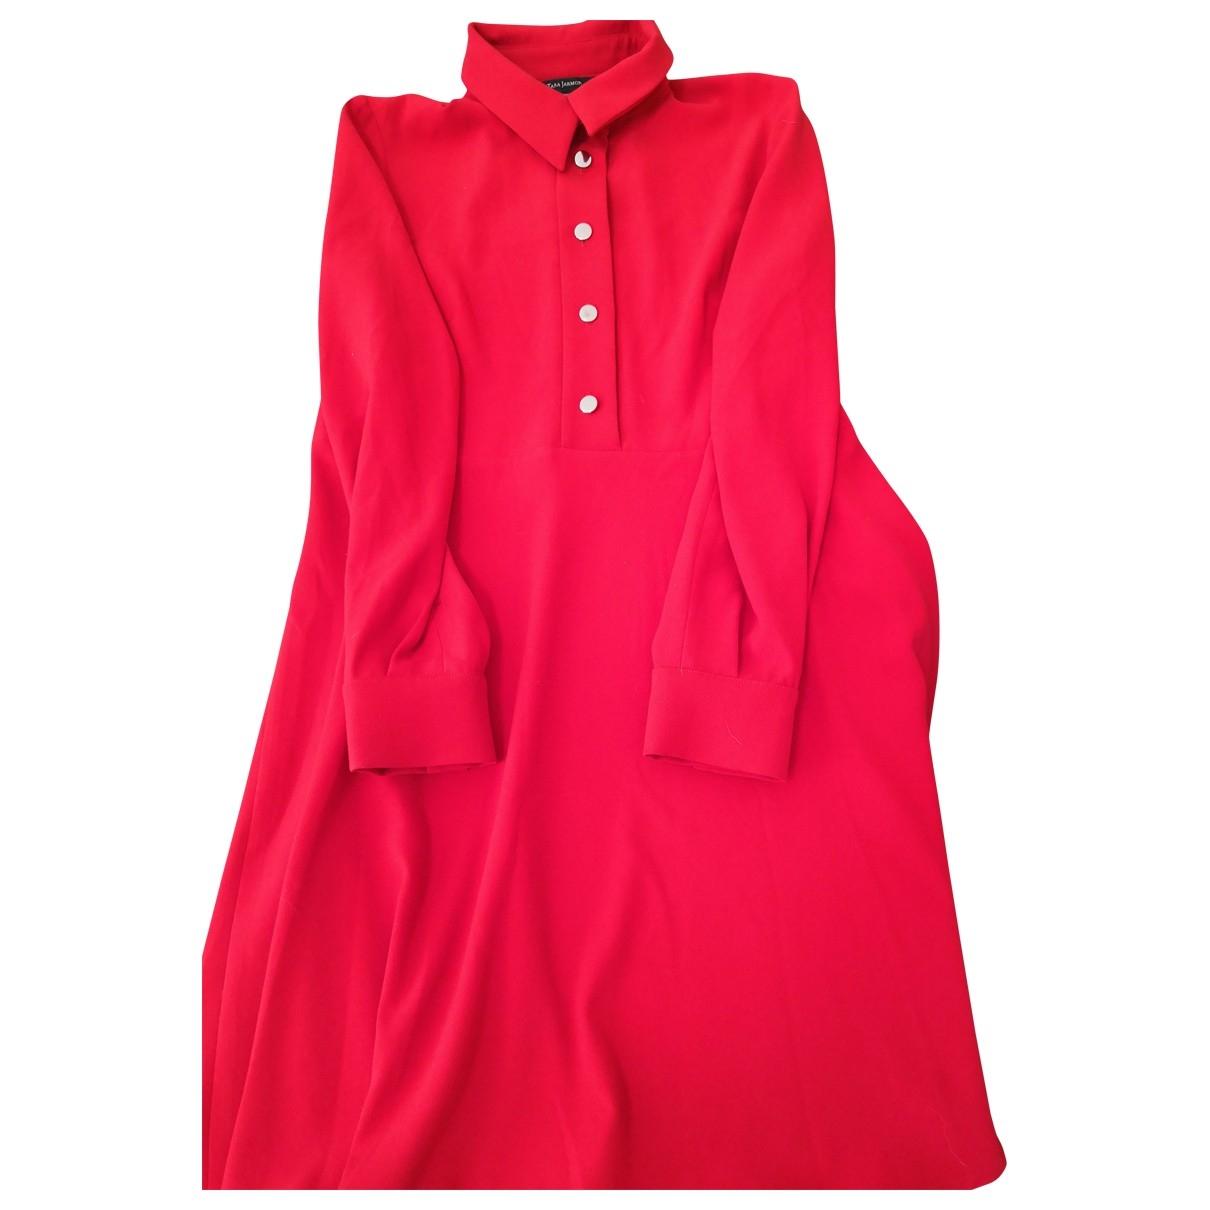 Tara Jarmon \N Kleid in  Rot Polyester